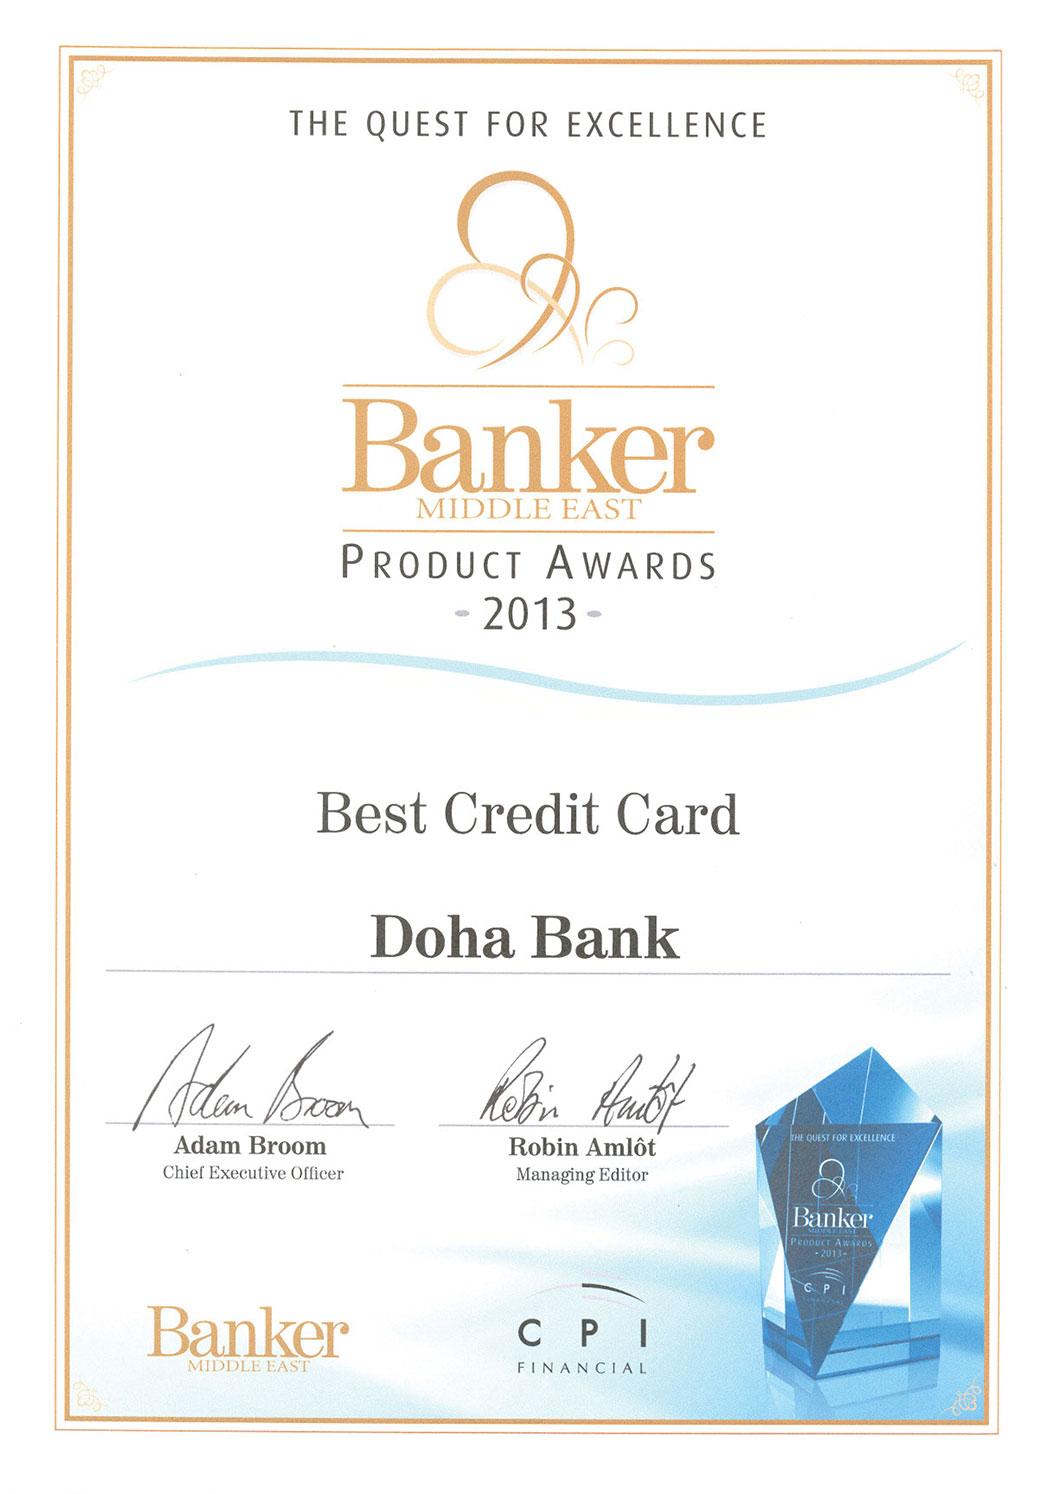 Best Credit Card award